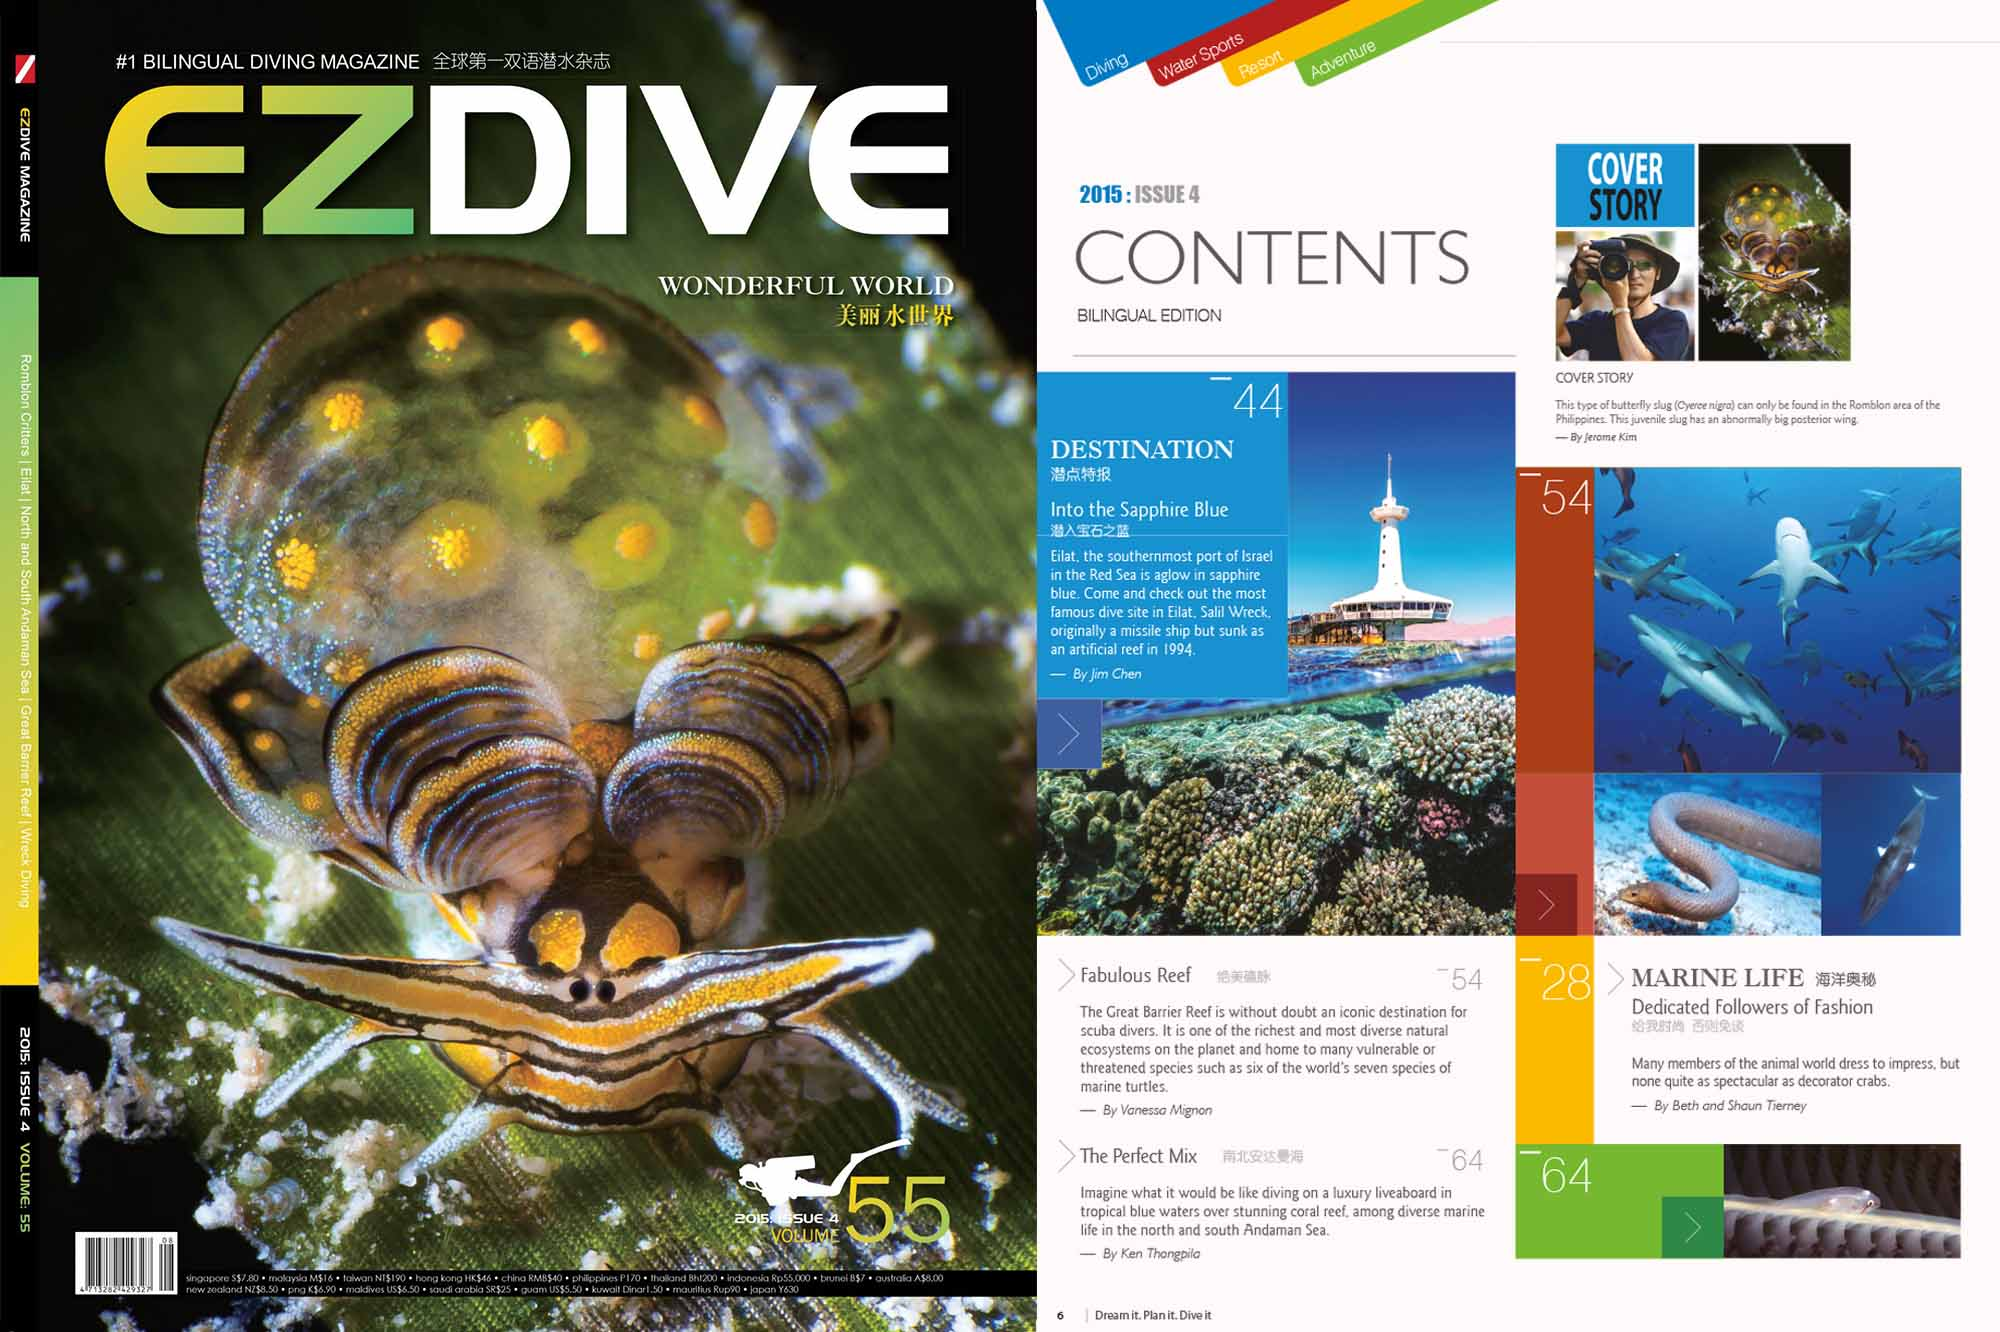 www.the-three-p.com-romblon-island-underwater-macro-photography-scuba-diving-philippines-publications-ezdive-magazine-no-55-romblon-article-cover